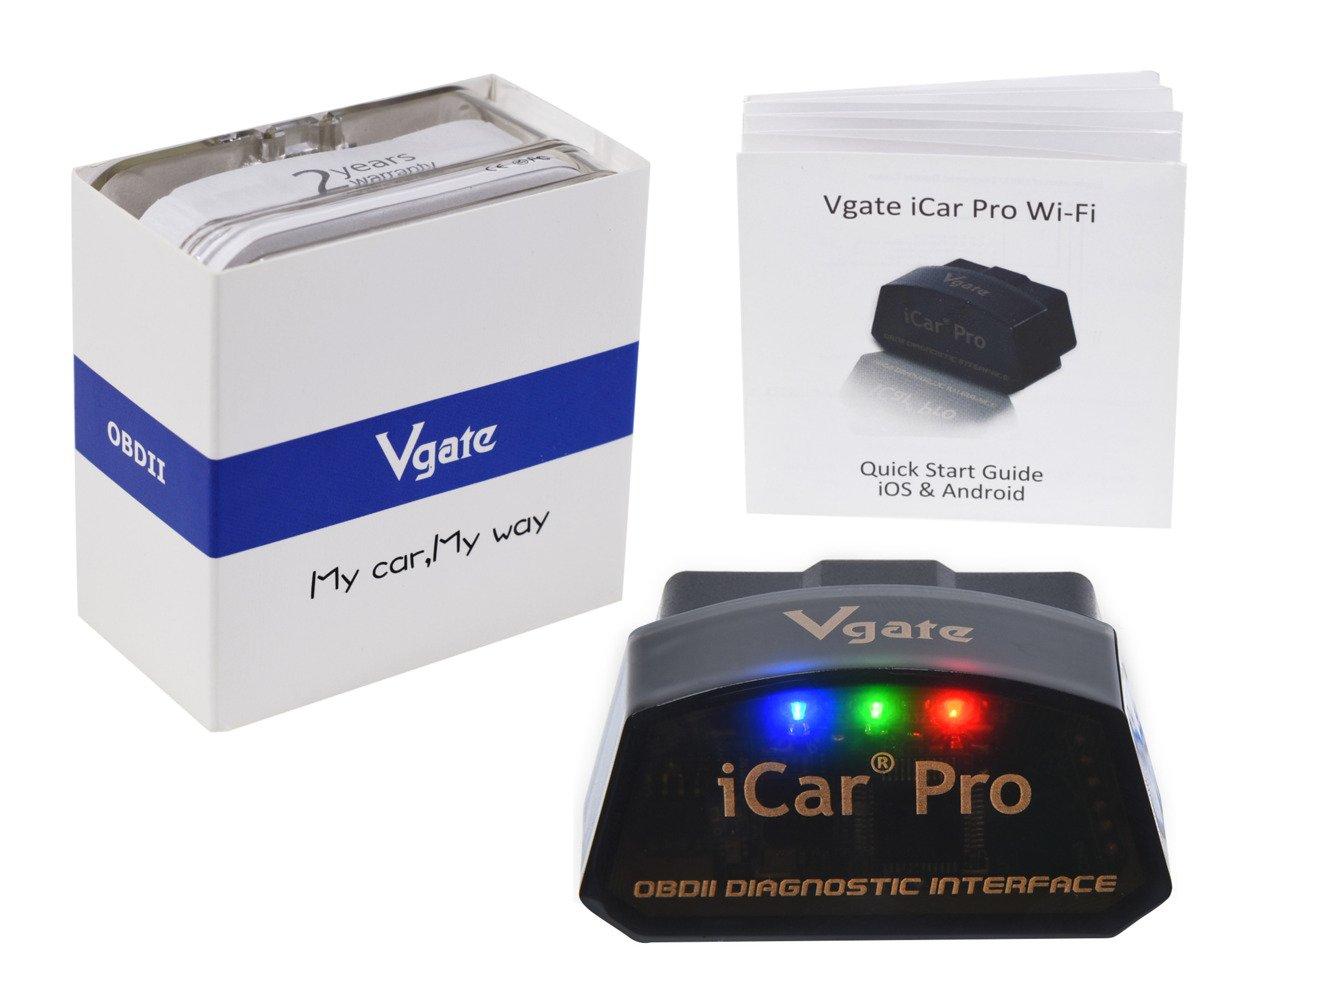 icar pro vgate wifi obd2 elm327 id49 wifi car. Black Bedroom Furniture Sets. Home Design Ideas